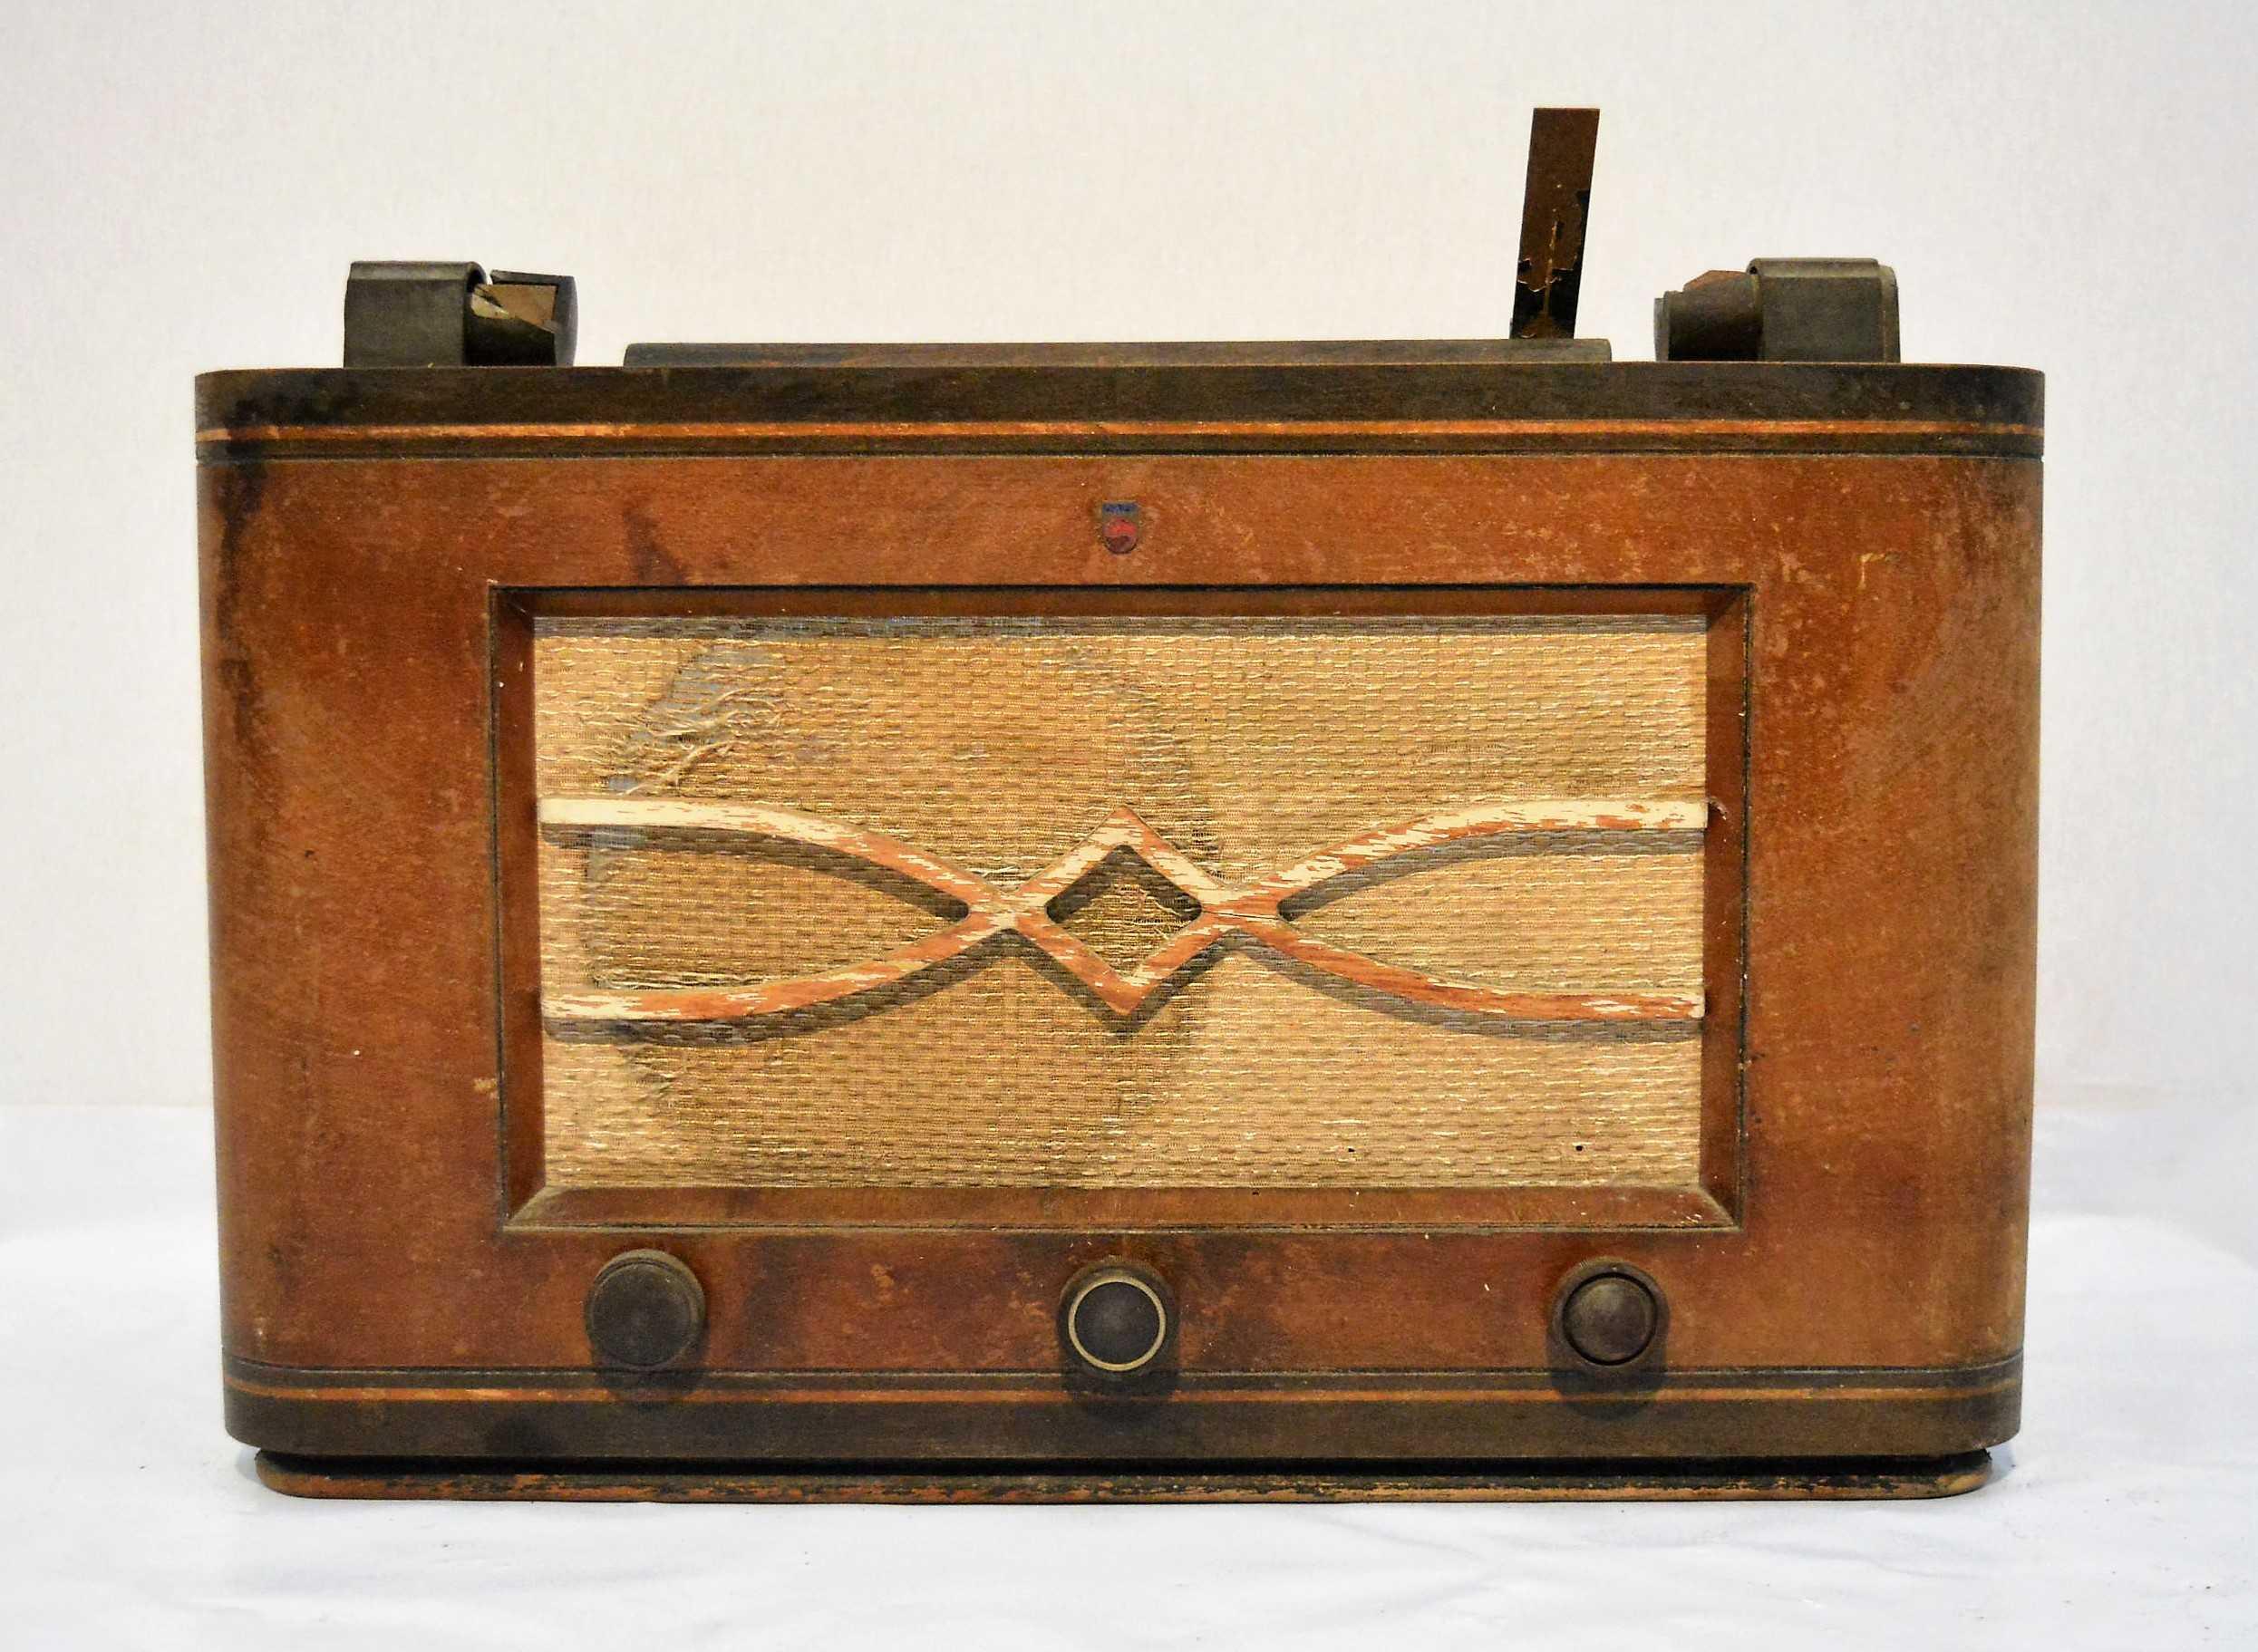 RADIO PHILLIPS 104-A